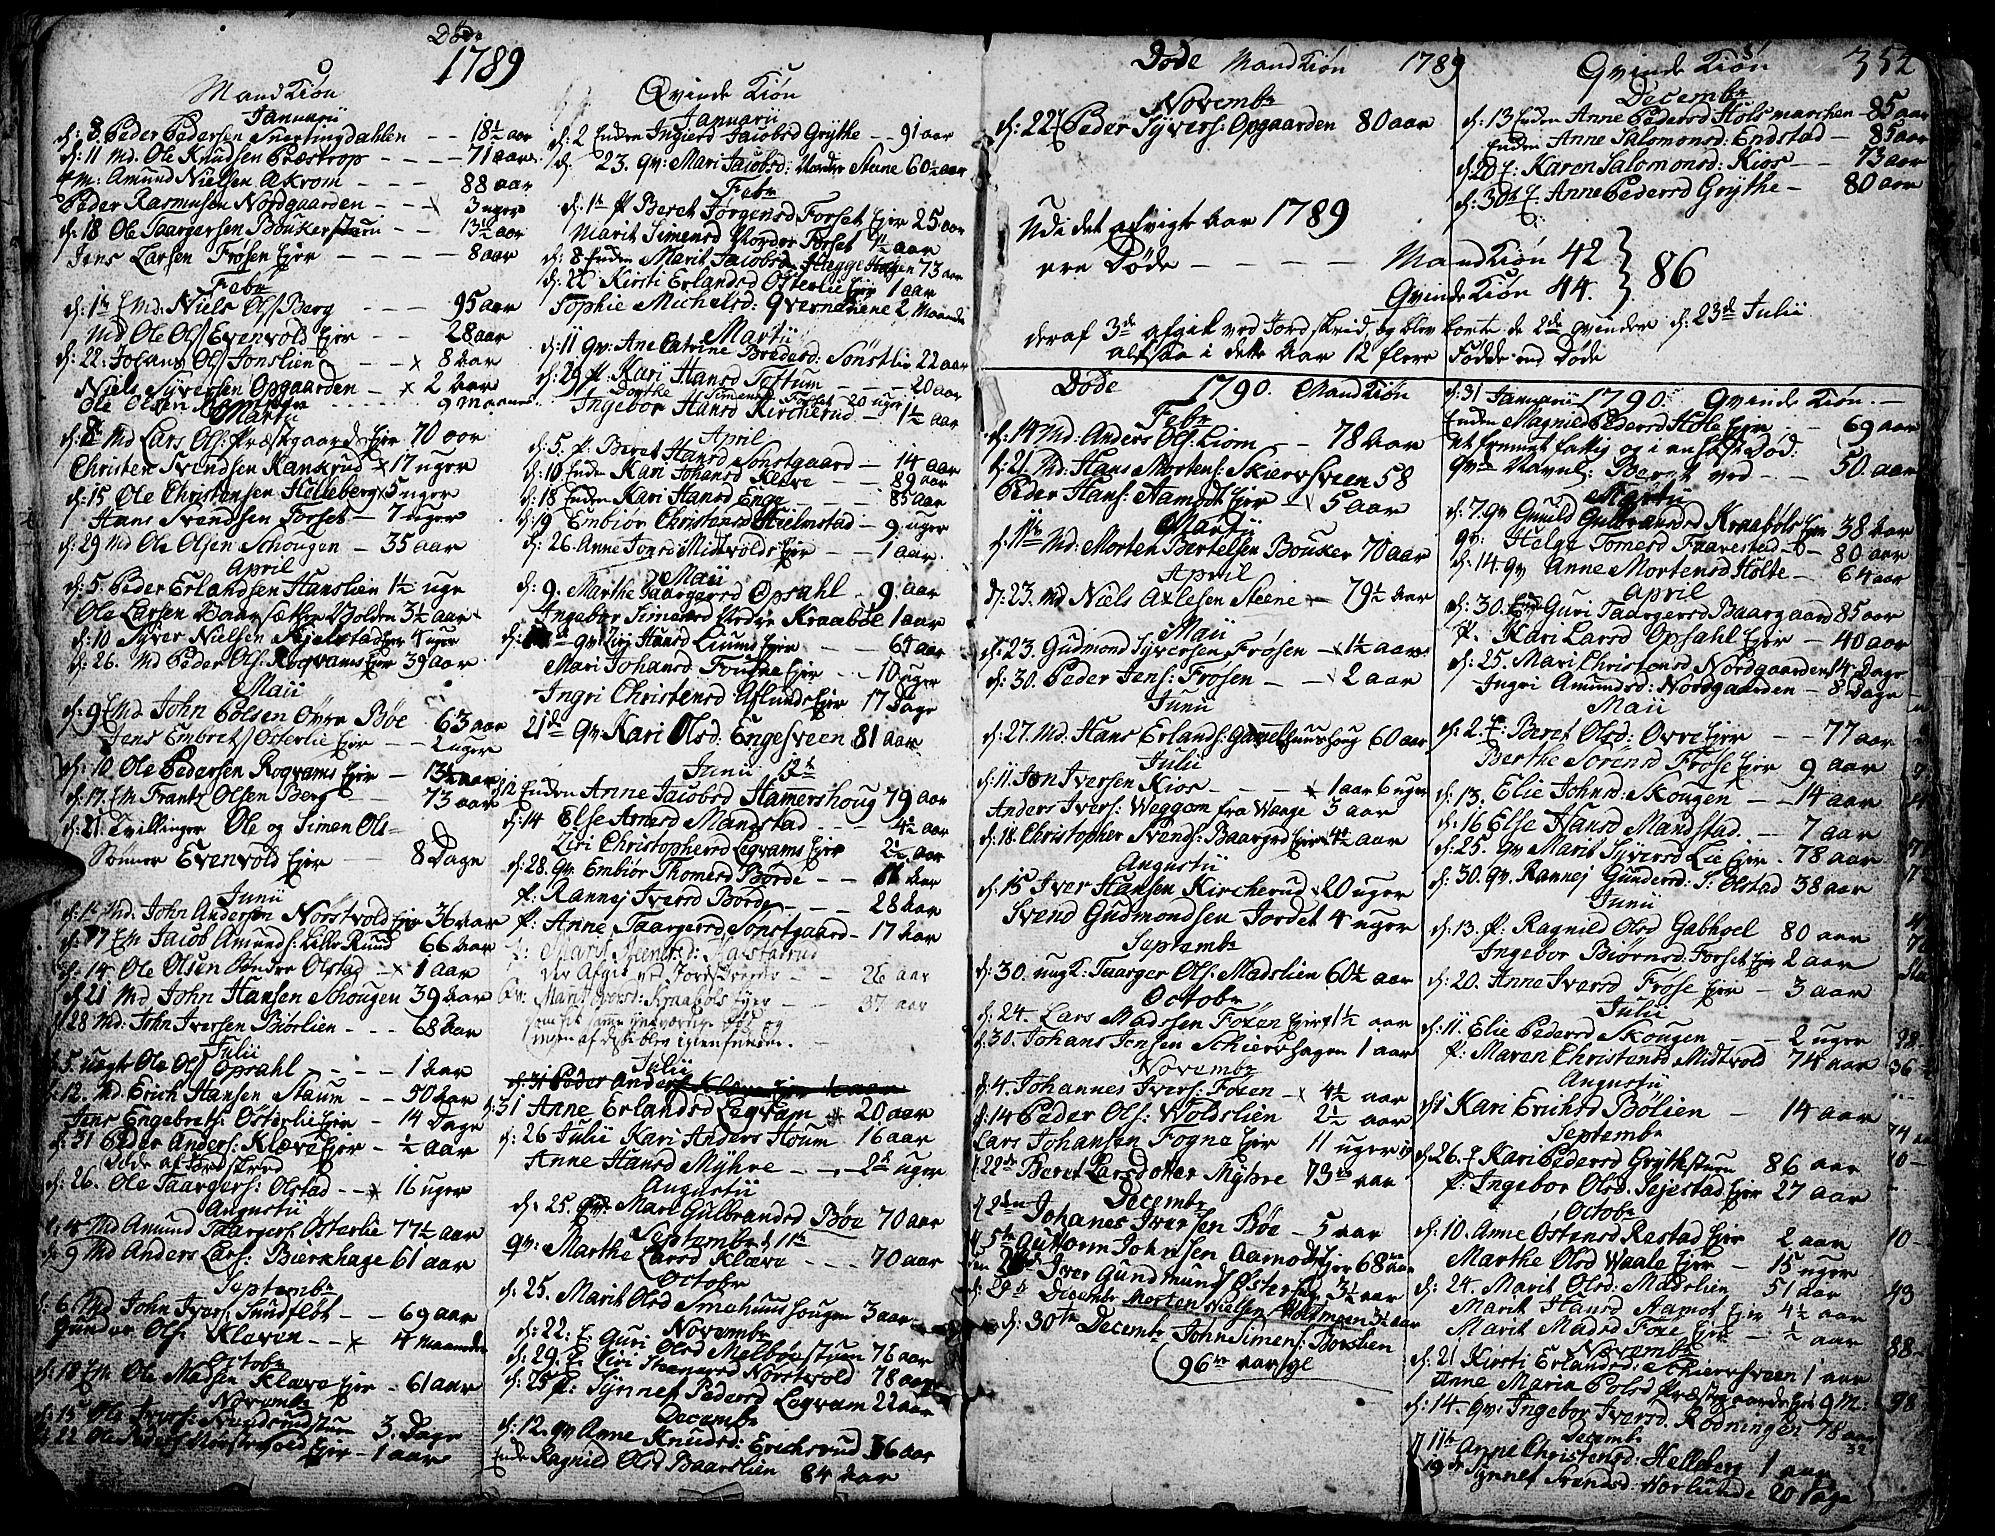 SAH, Gausdal prestekontor, Ministerialbok nr. 3, 1758-1809, s. 354